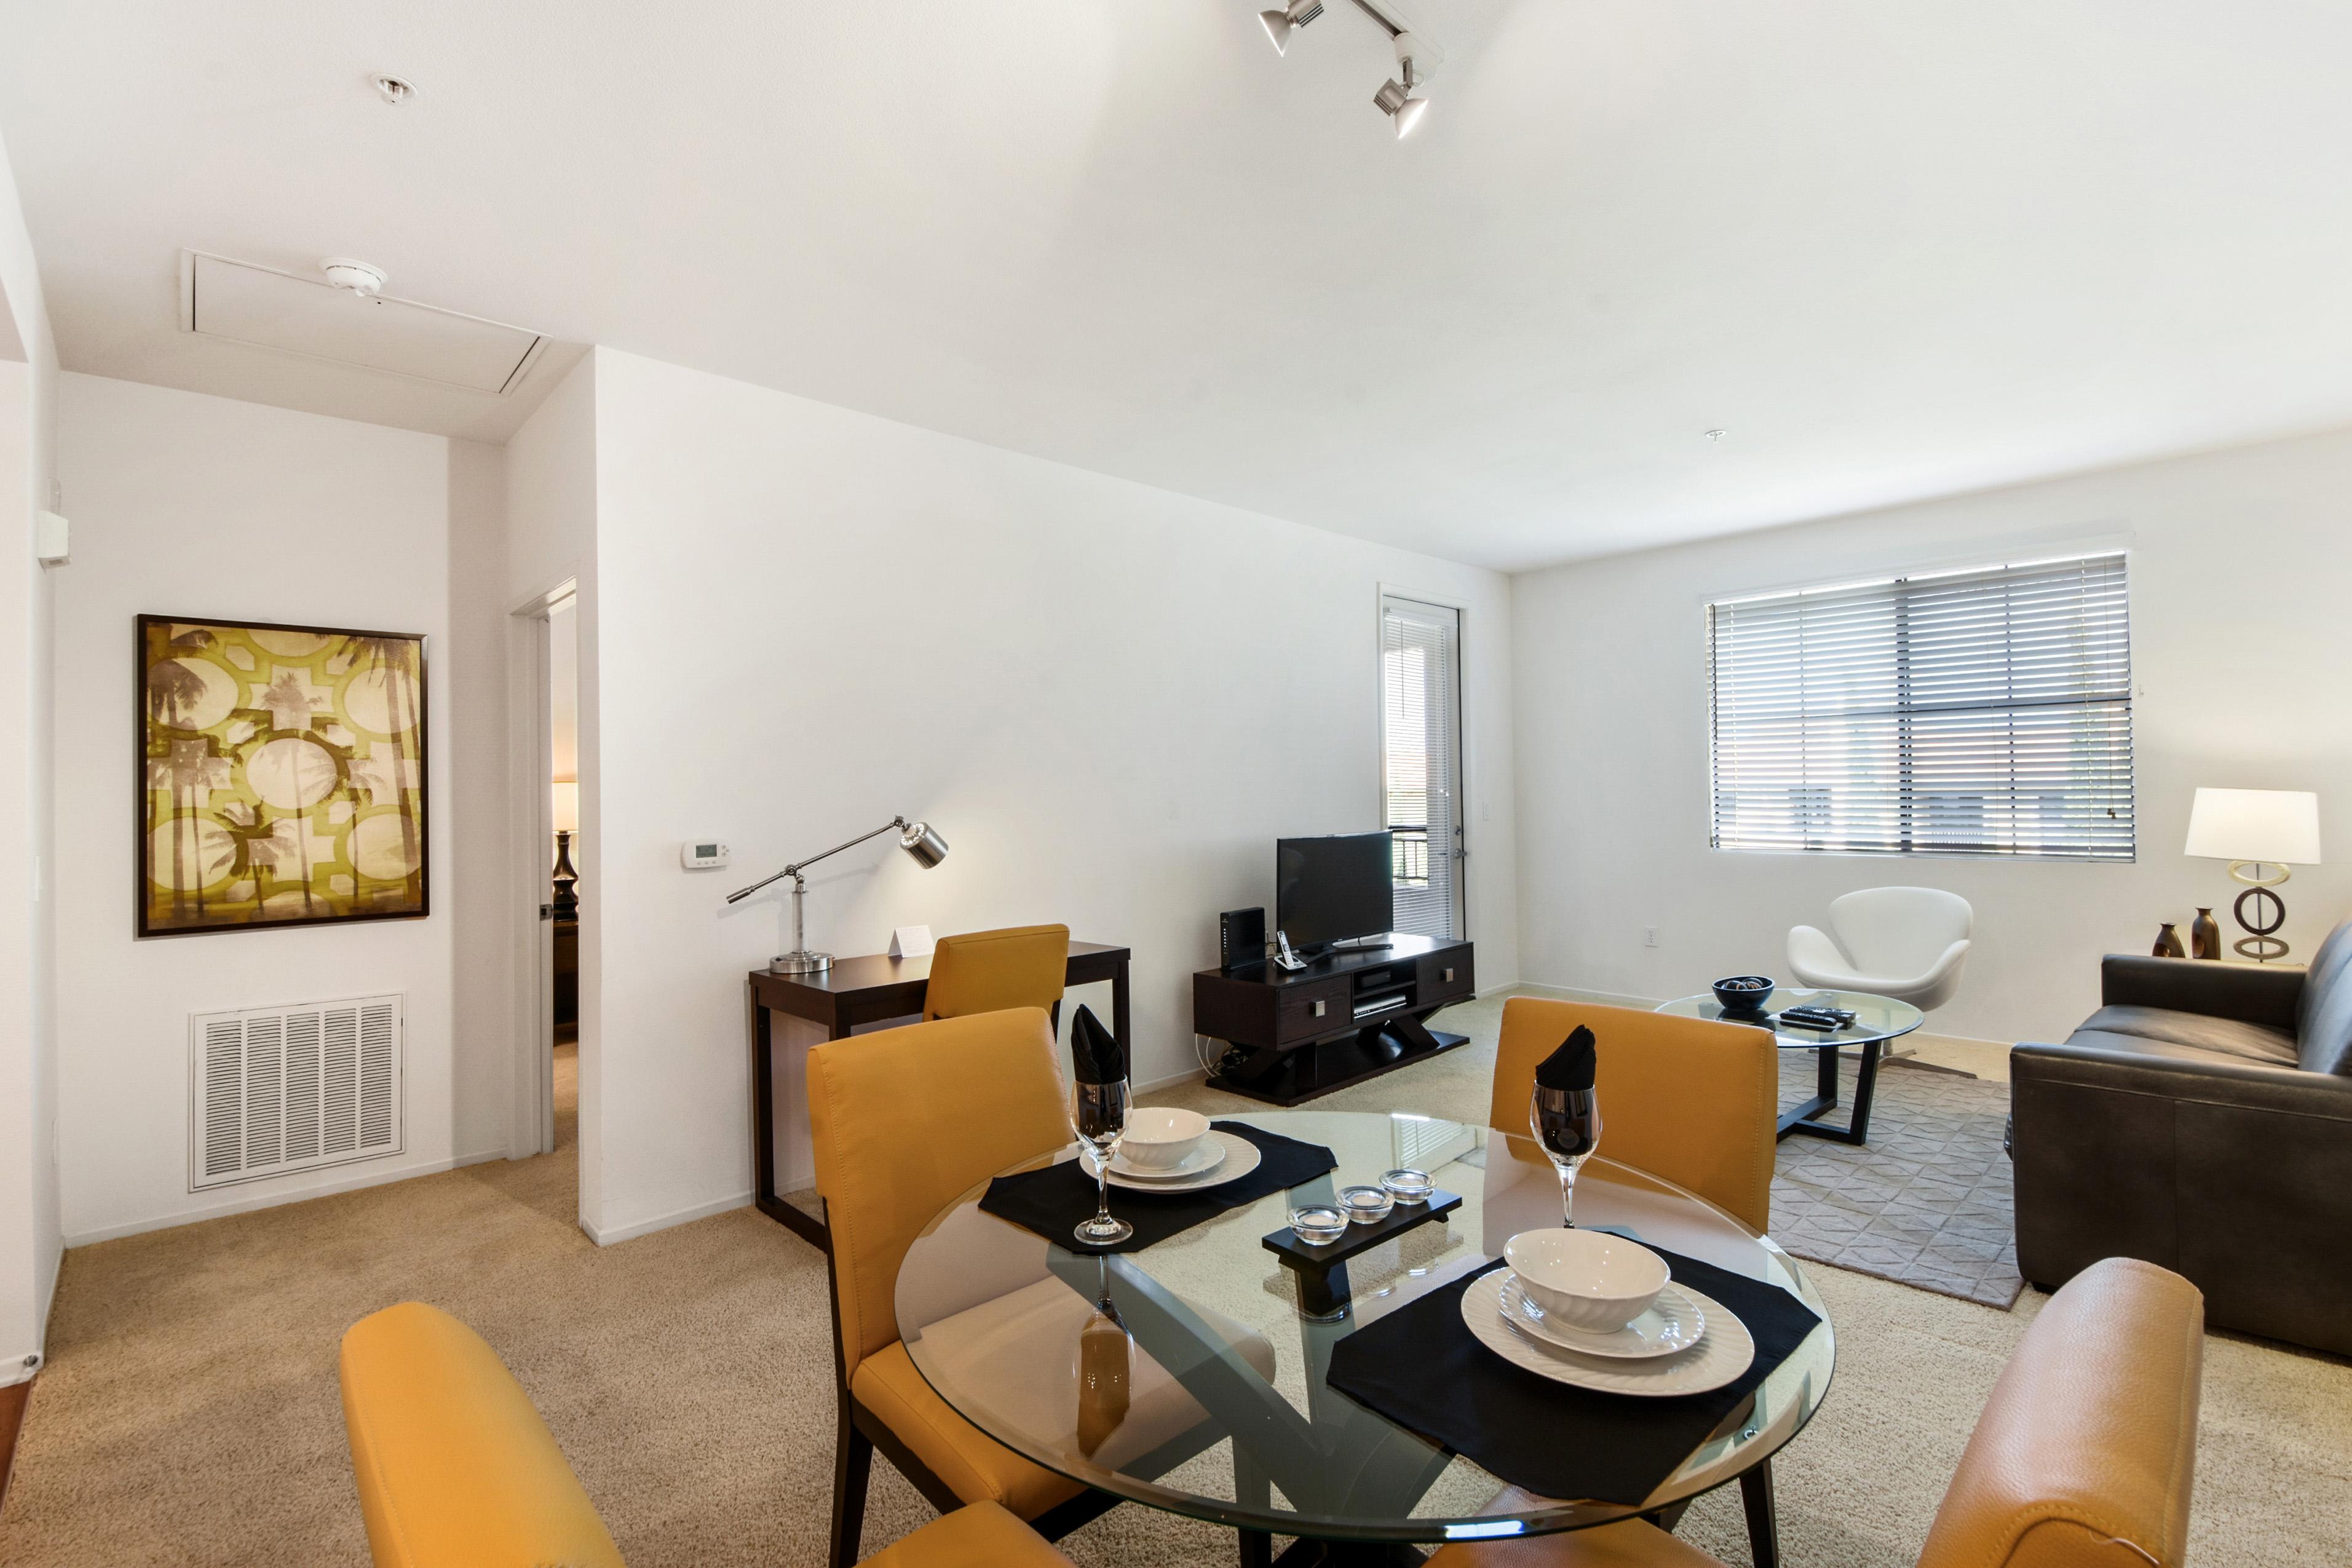 image 4 furnished 1 bedroom Apartment for rent in Irvine, Orange County